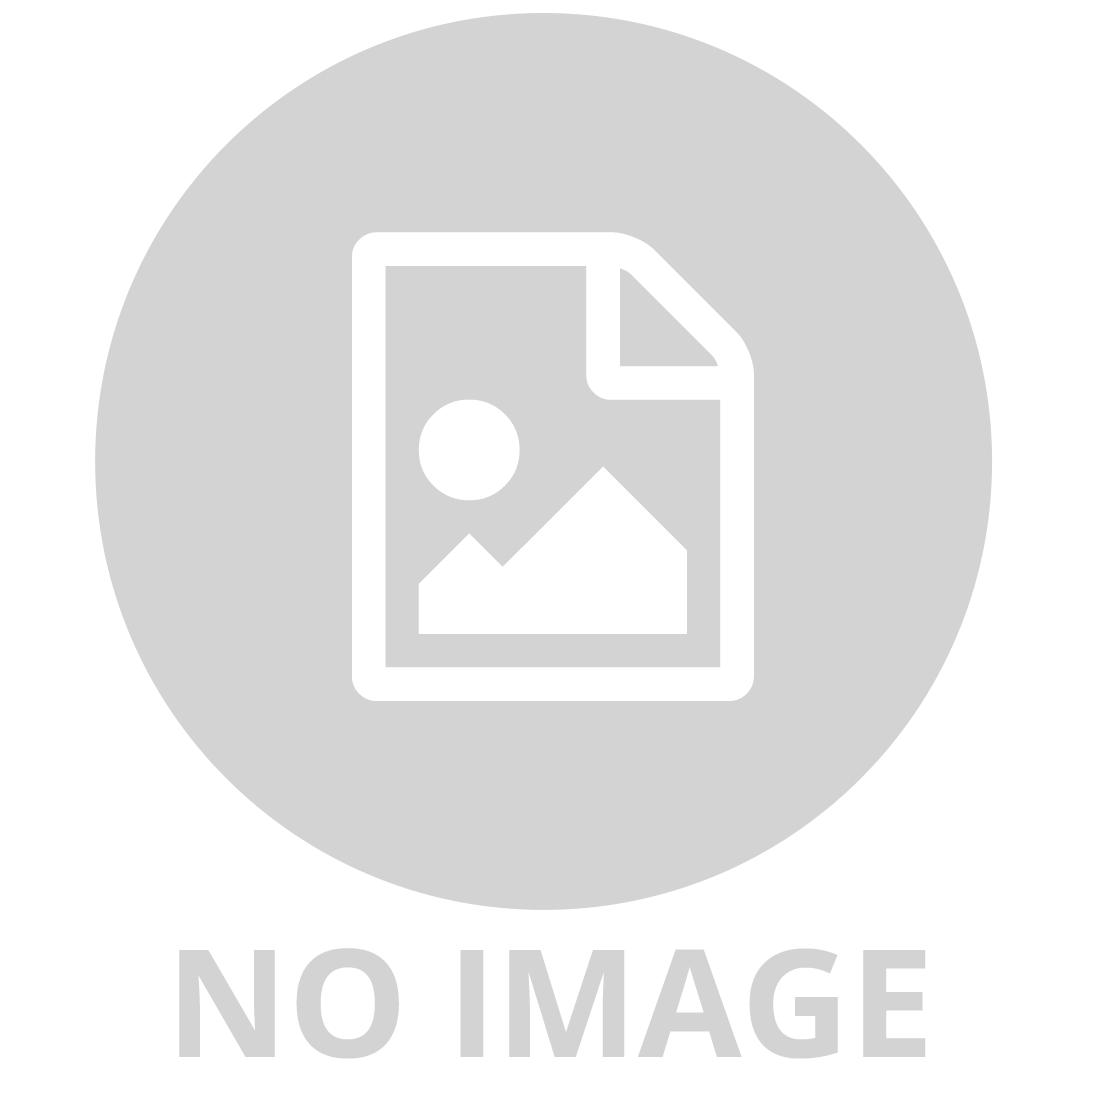 RESCUE SUPER HERO WALKIE TALKIE COMBO SET